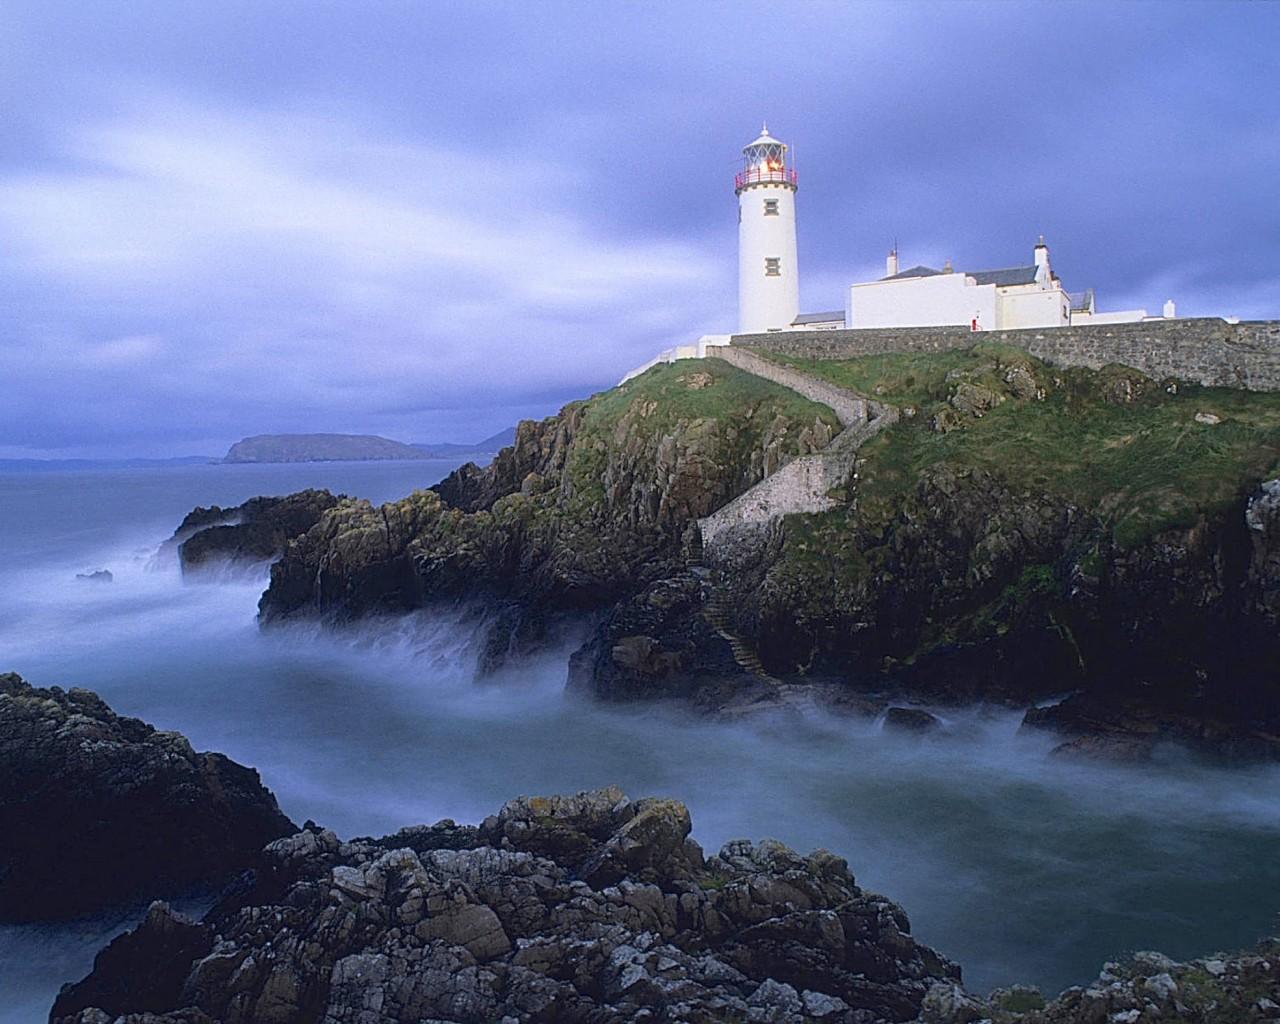 Cute Cat Wallpaper 3d Fanad Head Lighthouse Ireland Wallpaper Free Hd